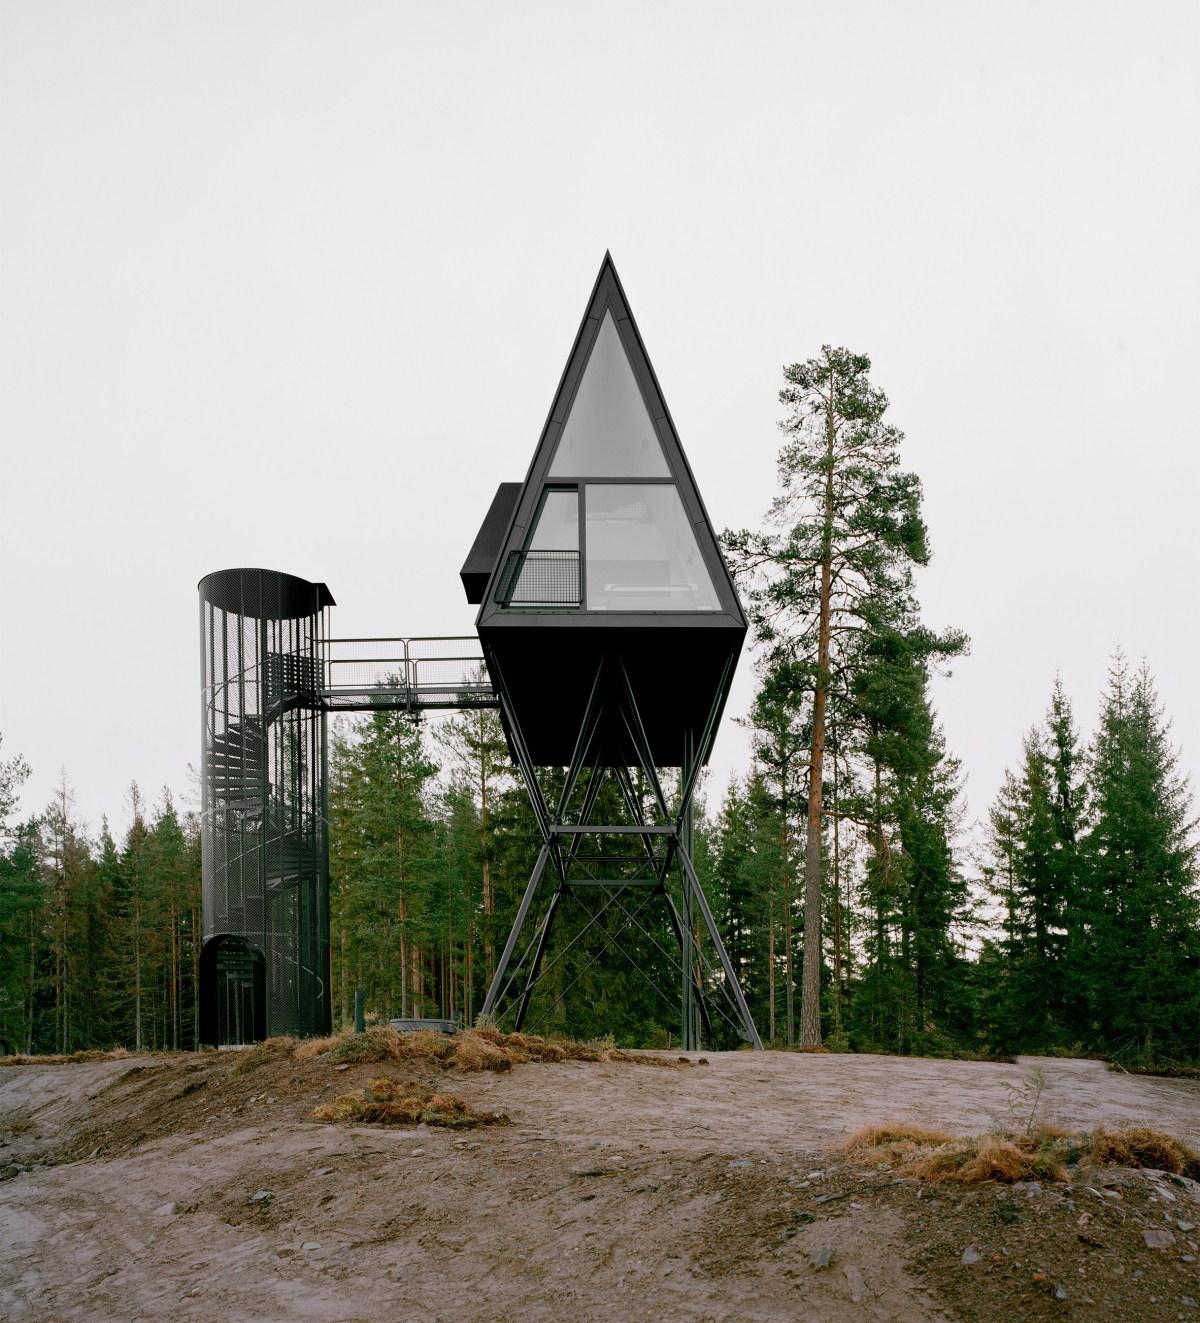 pan-treetop-cabins-espen-surnevik-woodland-architecture-norway-_dezeen_2364_col_8